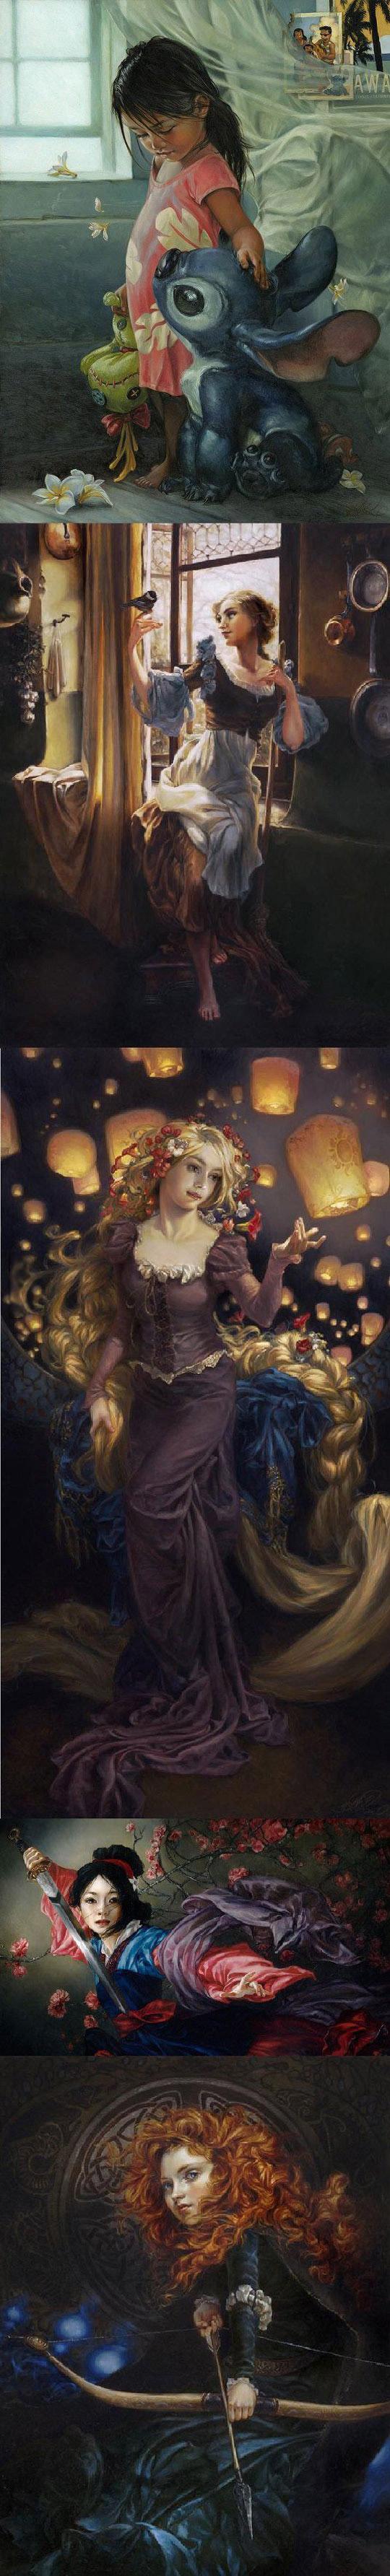 Peinture a l 39 huile disney recherche google disney - Peinture princesse disney ...